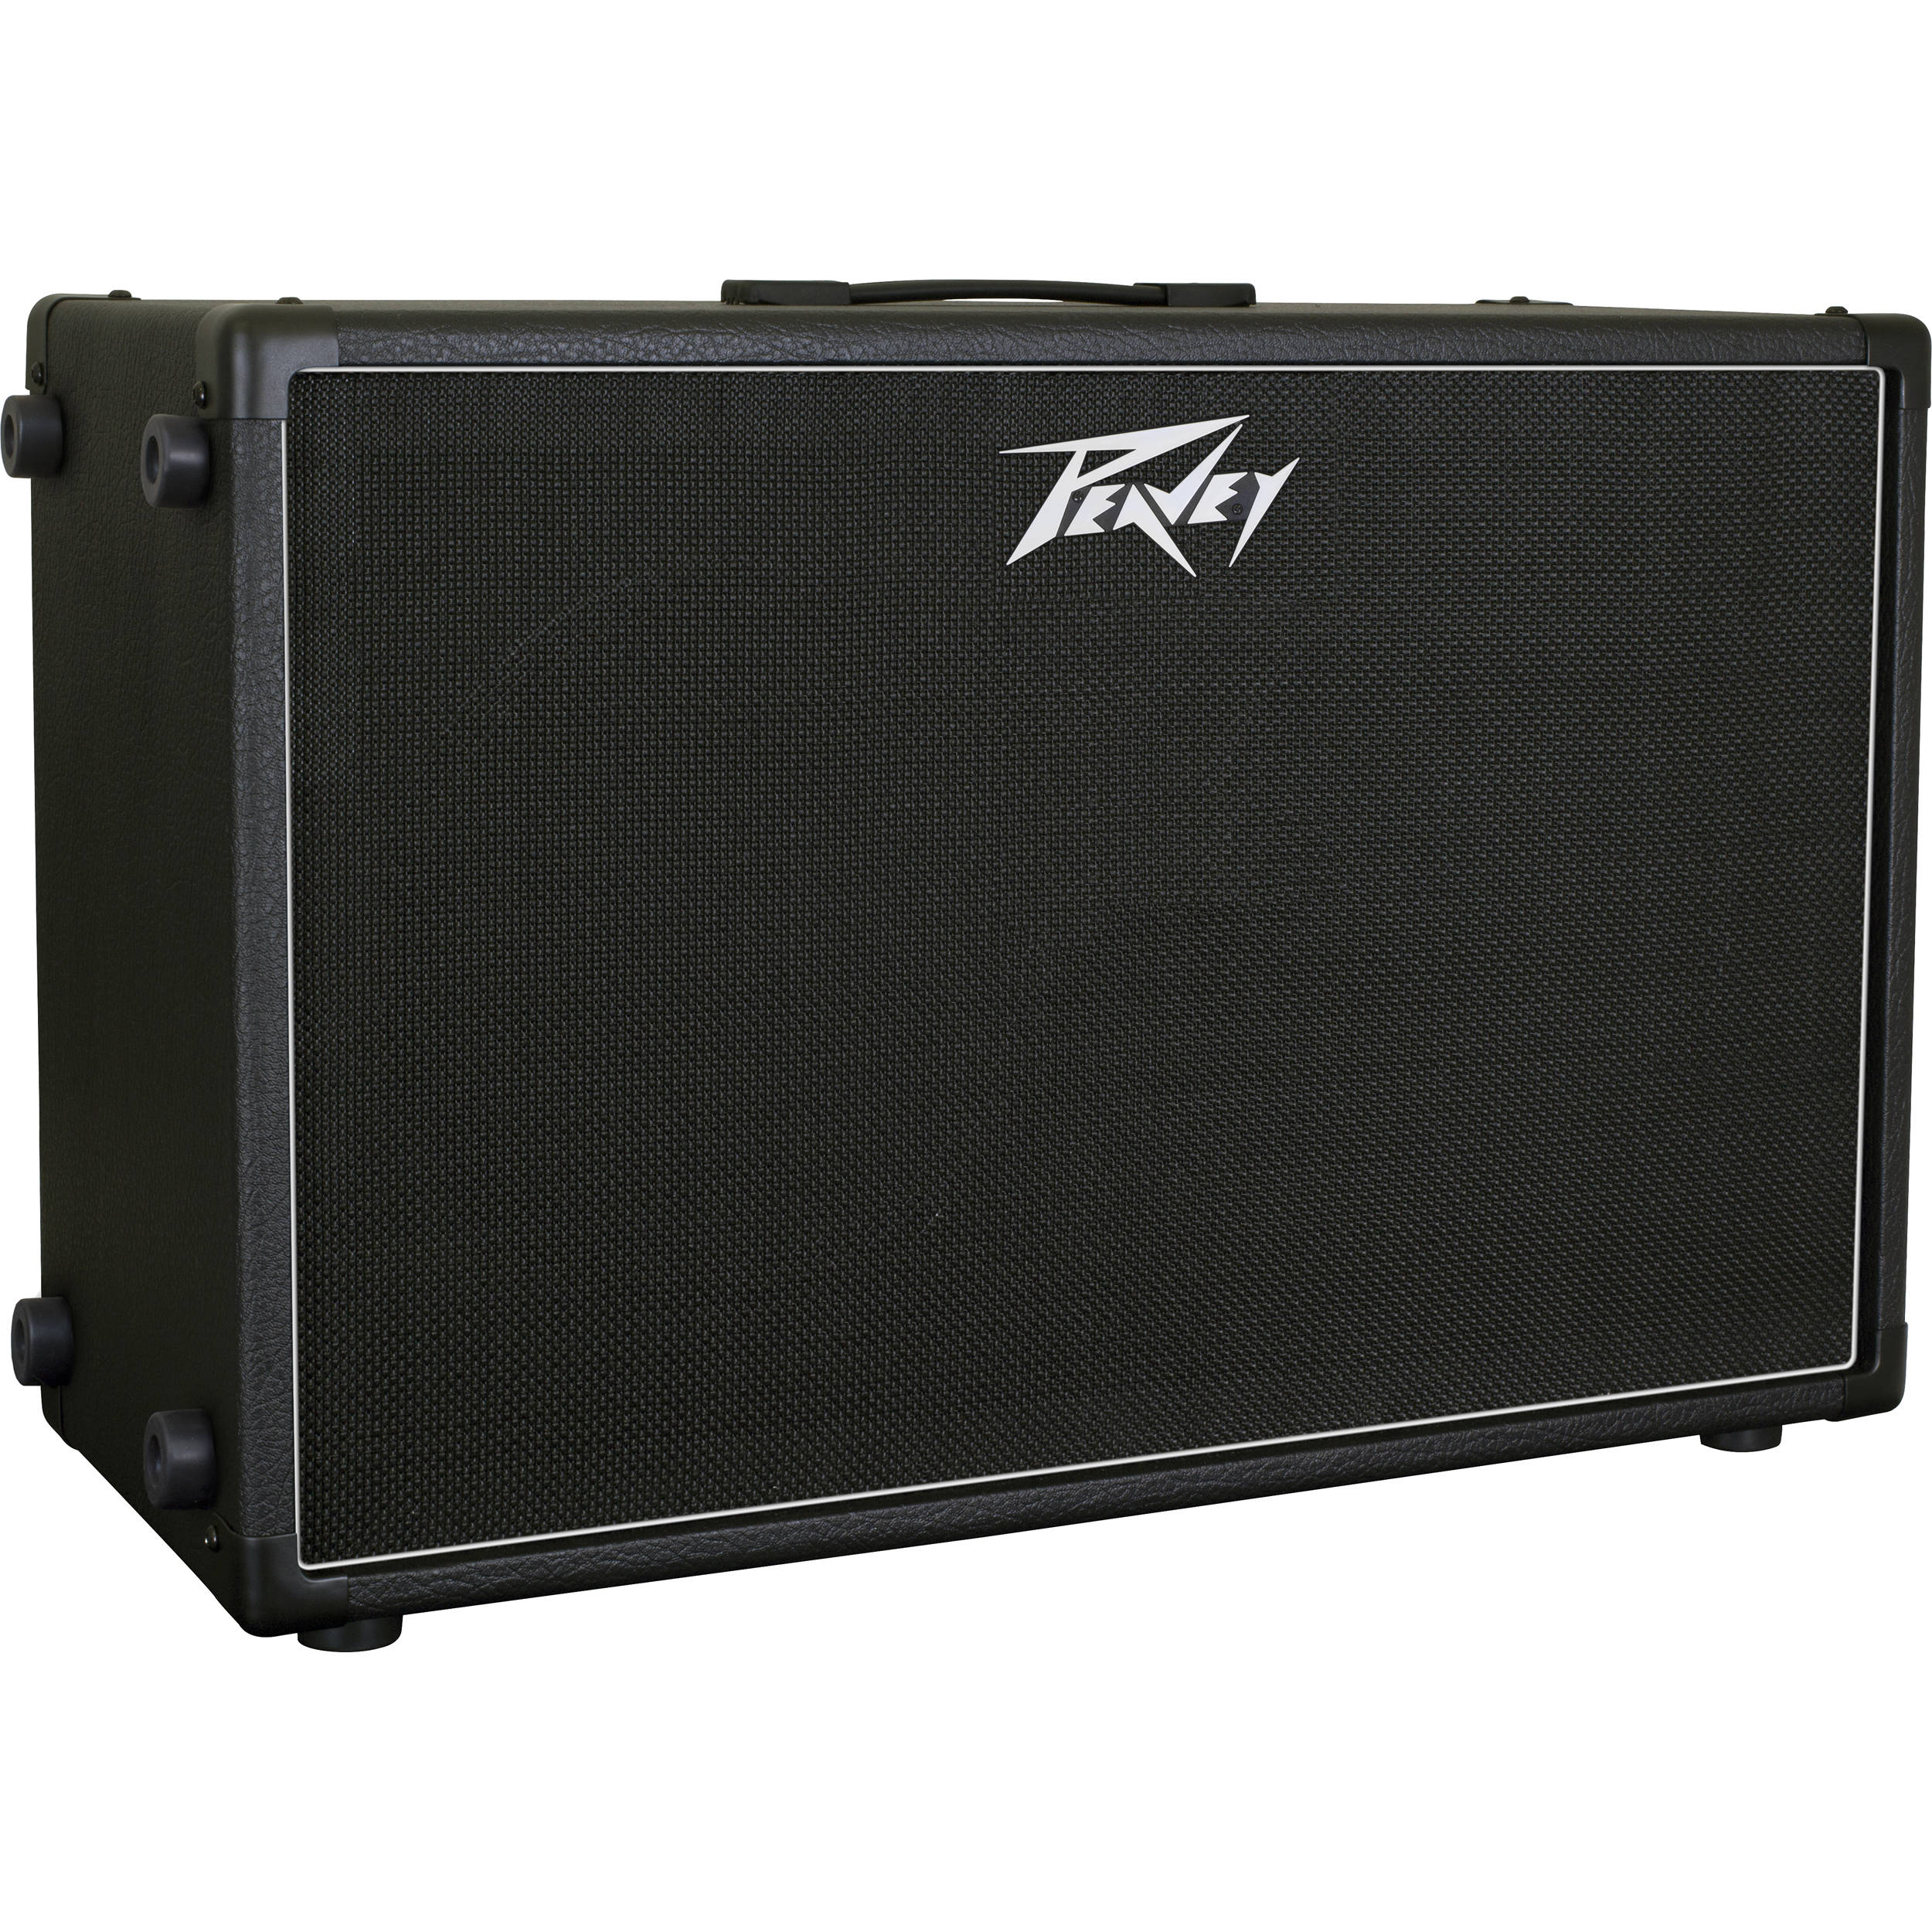 peavey 212 6 dual 12 guitar enclosure with celestion 03615010. Black Bedroom Furniture Sets. Home Design Ideas